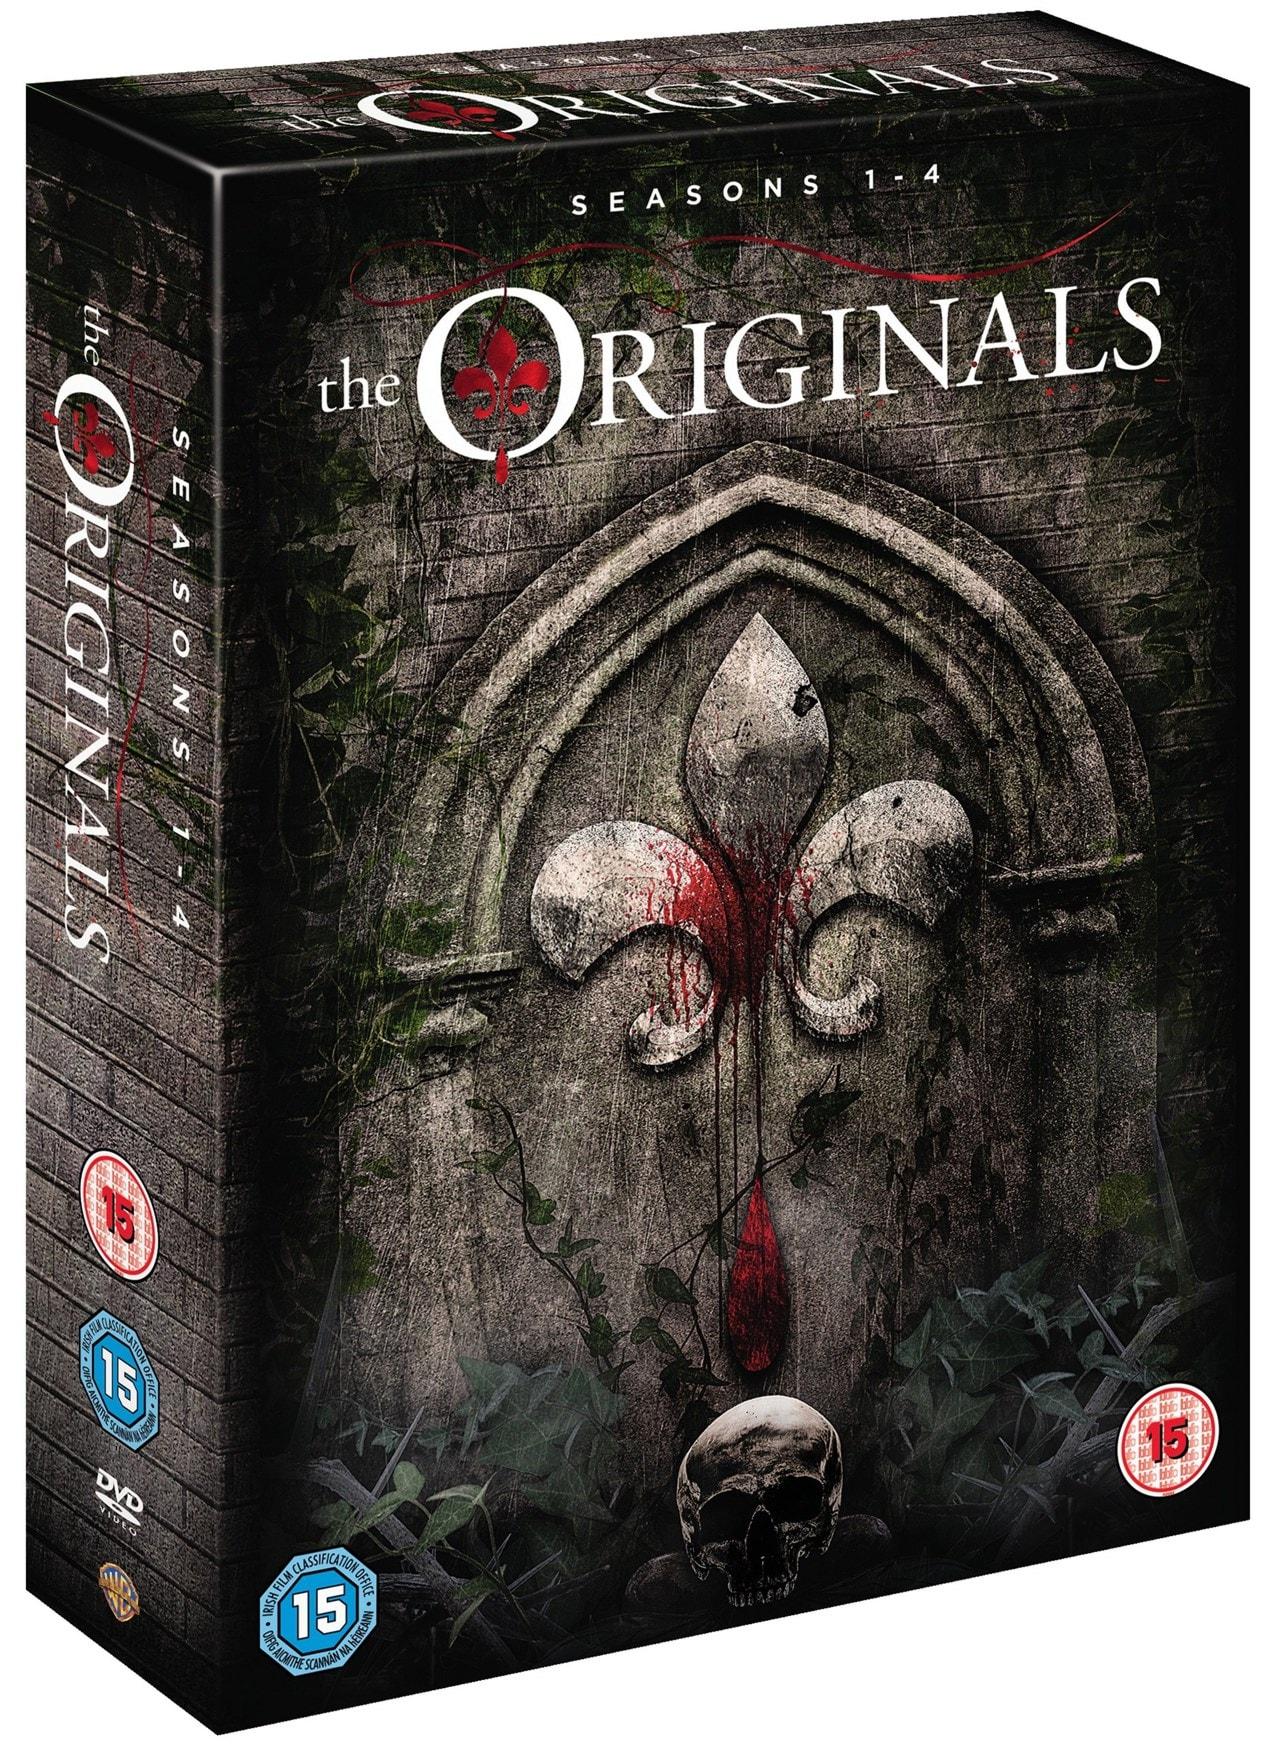 The Originals: Seasons 1-4 - 2